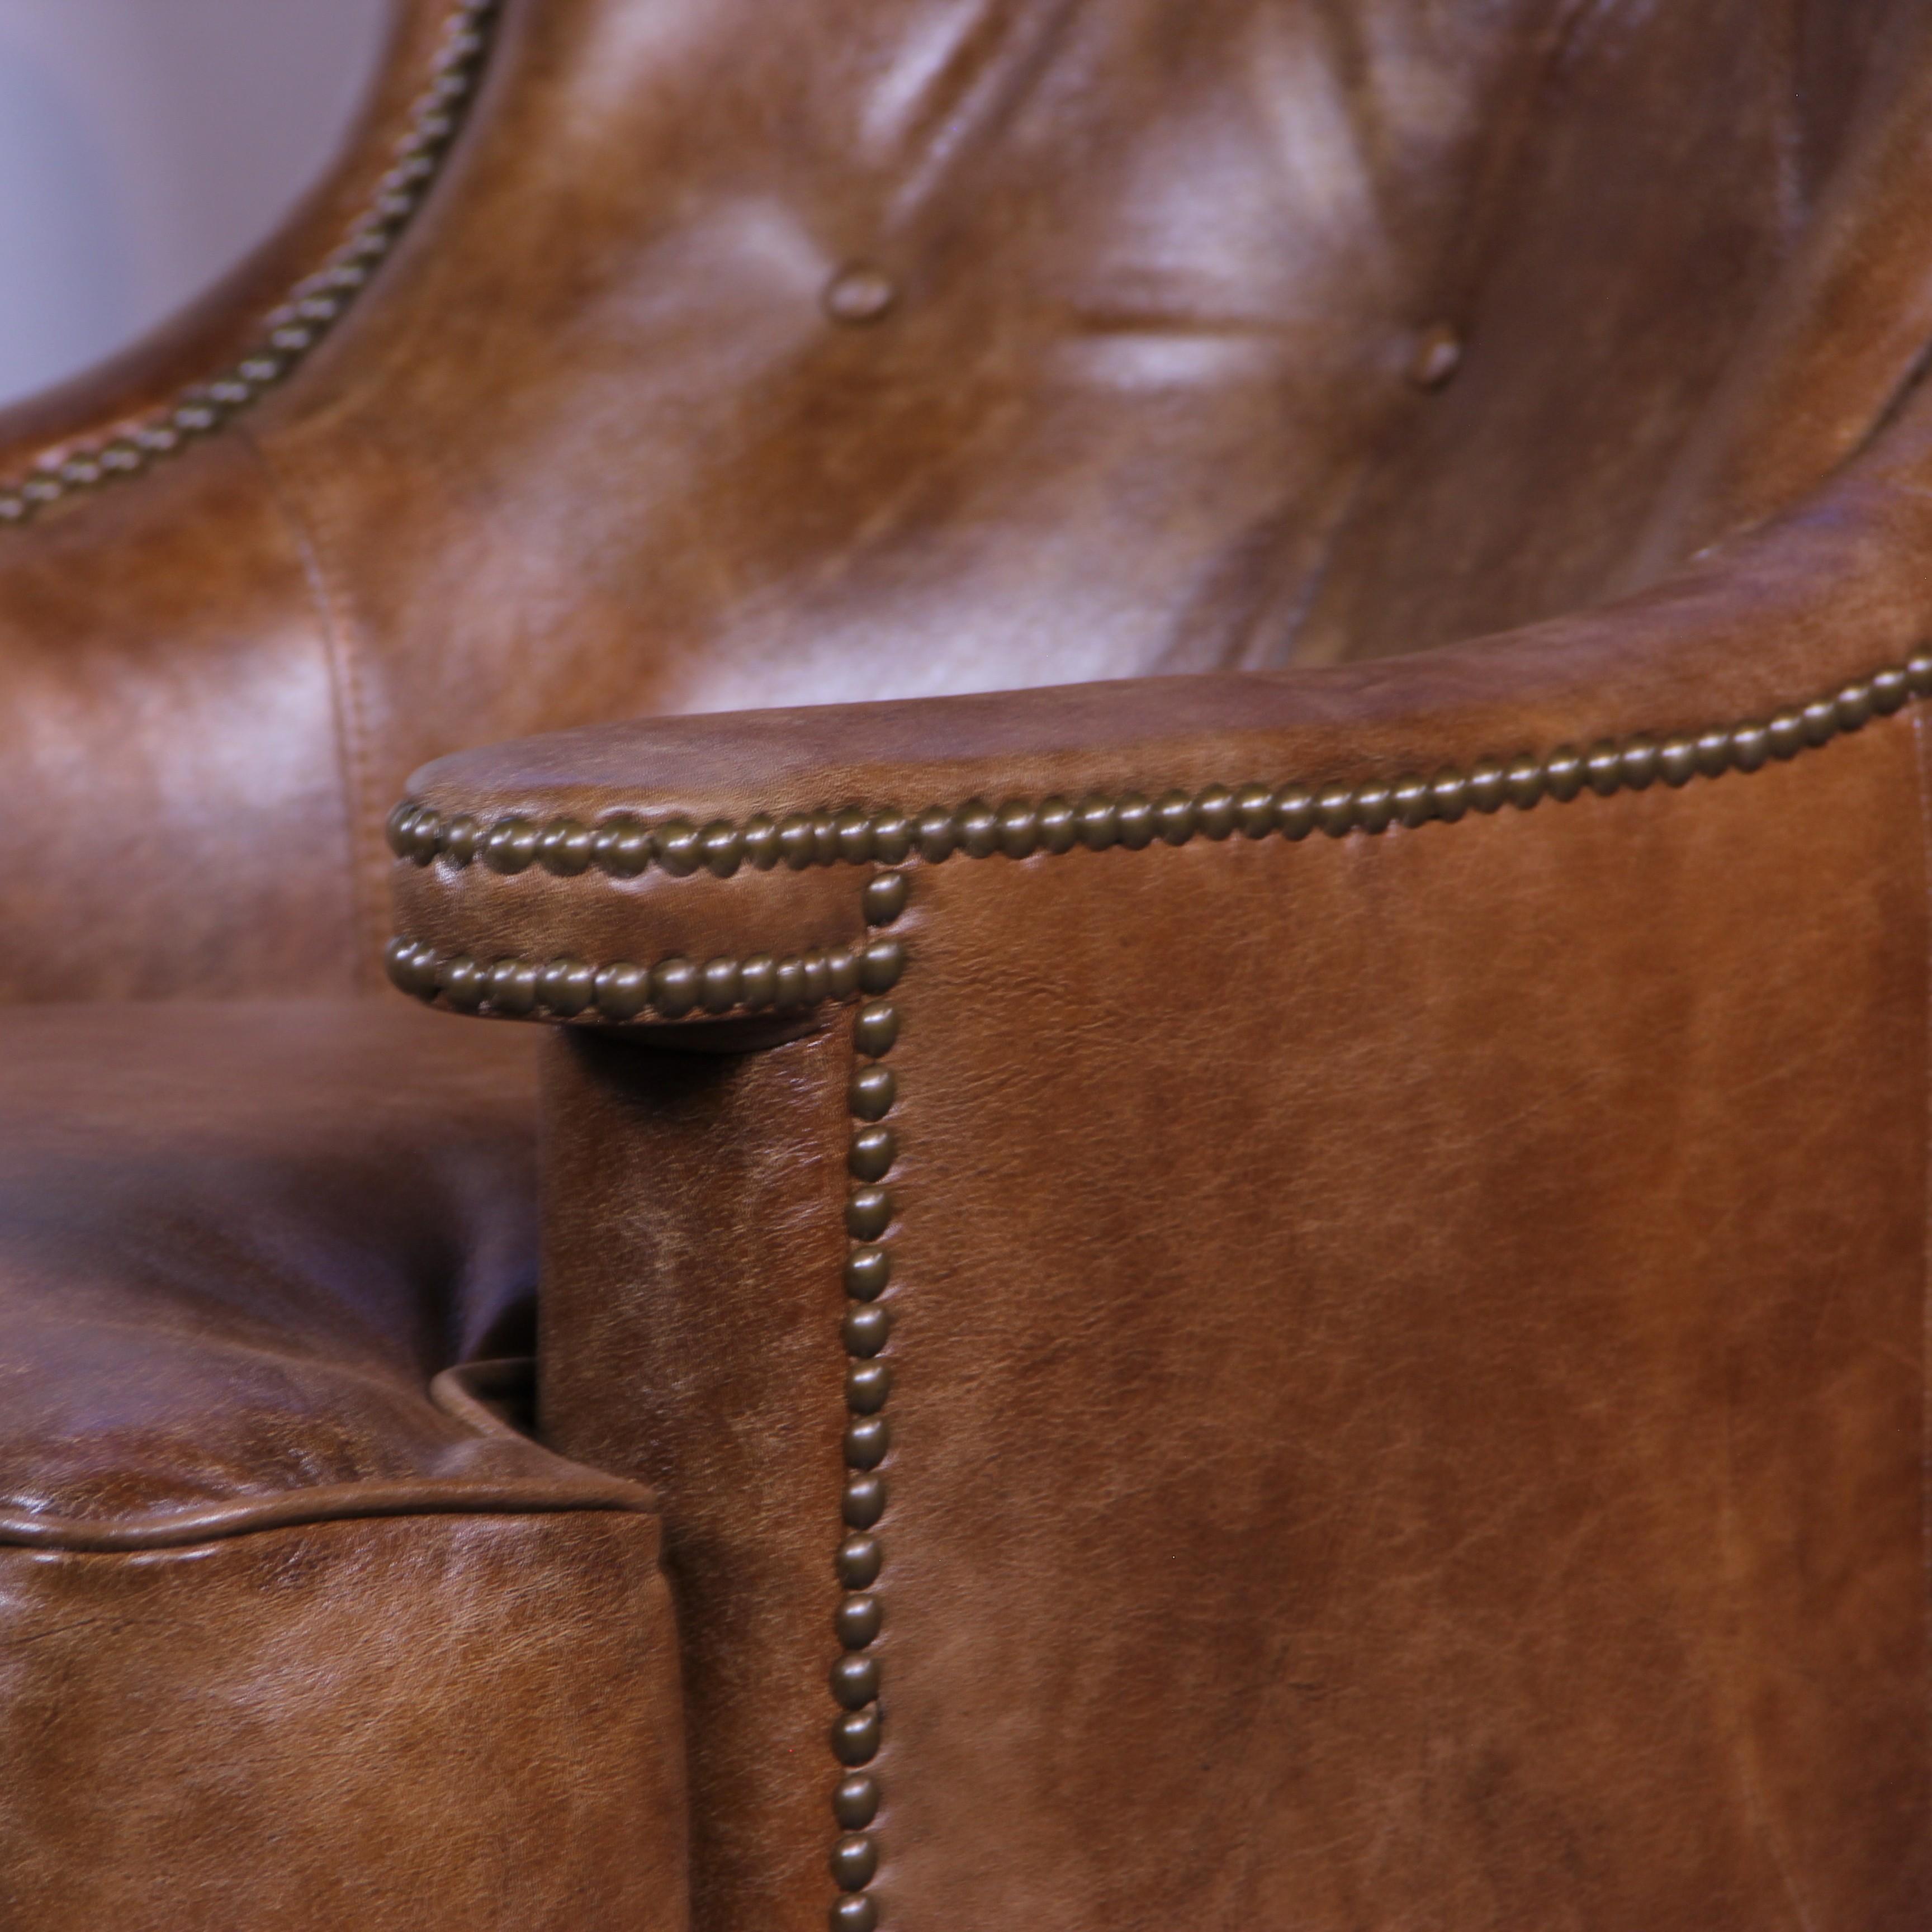 sofa chesterfield set mit zwei braunen ledersesseln vintage patina. Black Bedroom Furniture Sets. Home Design Ideas